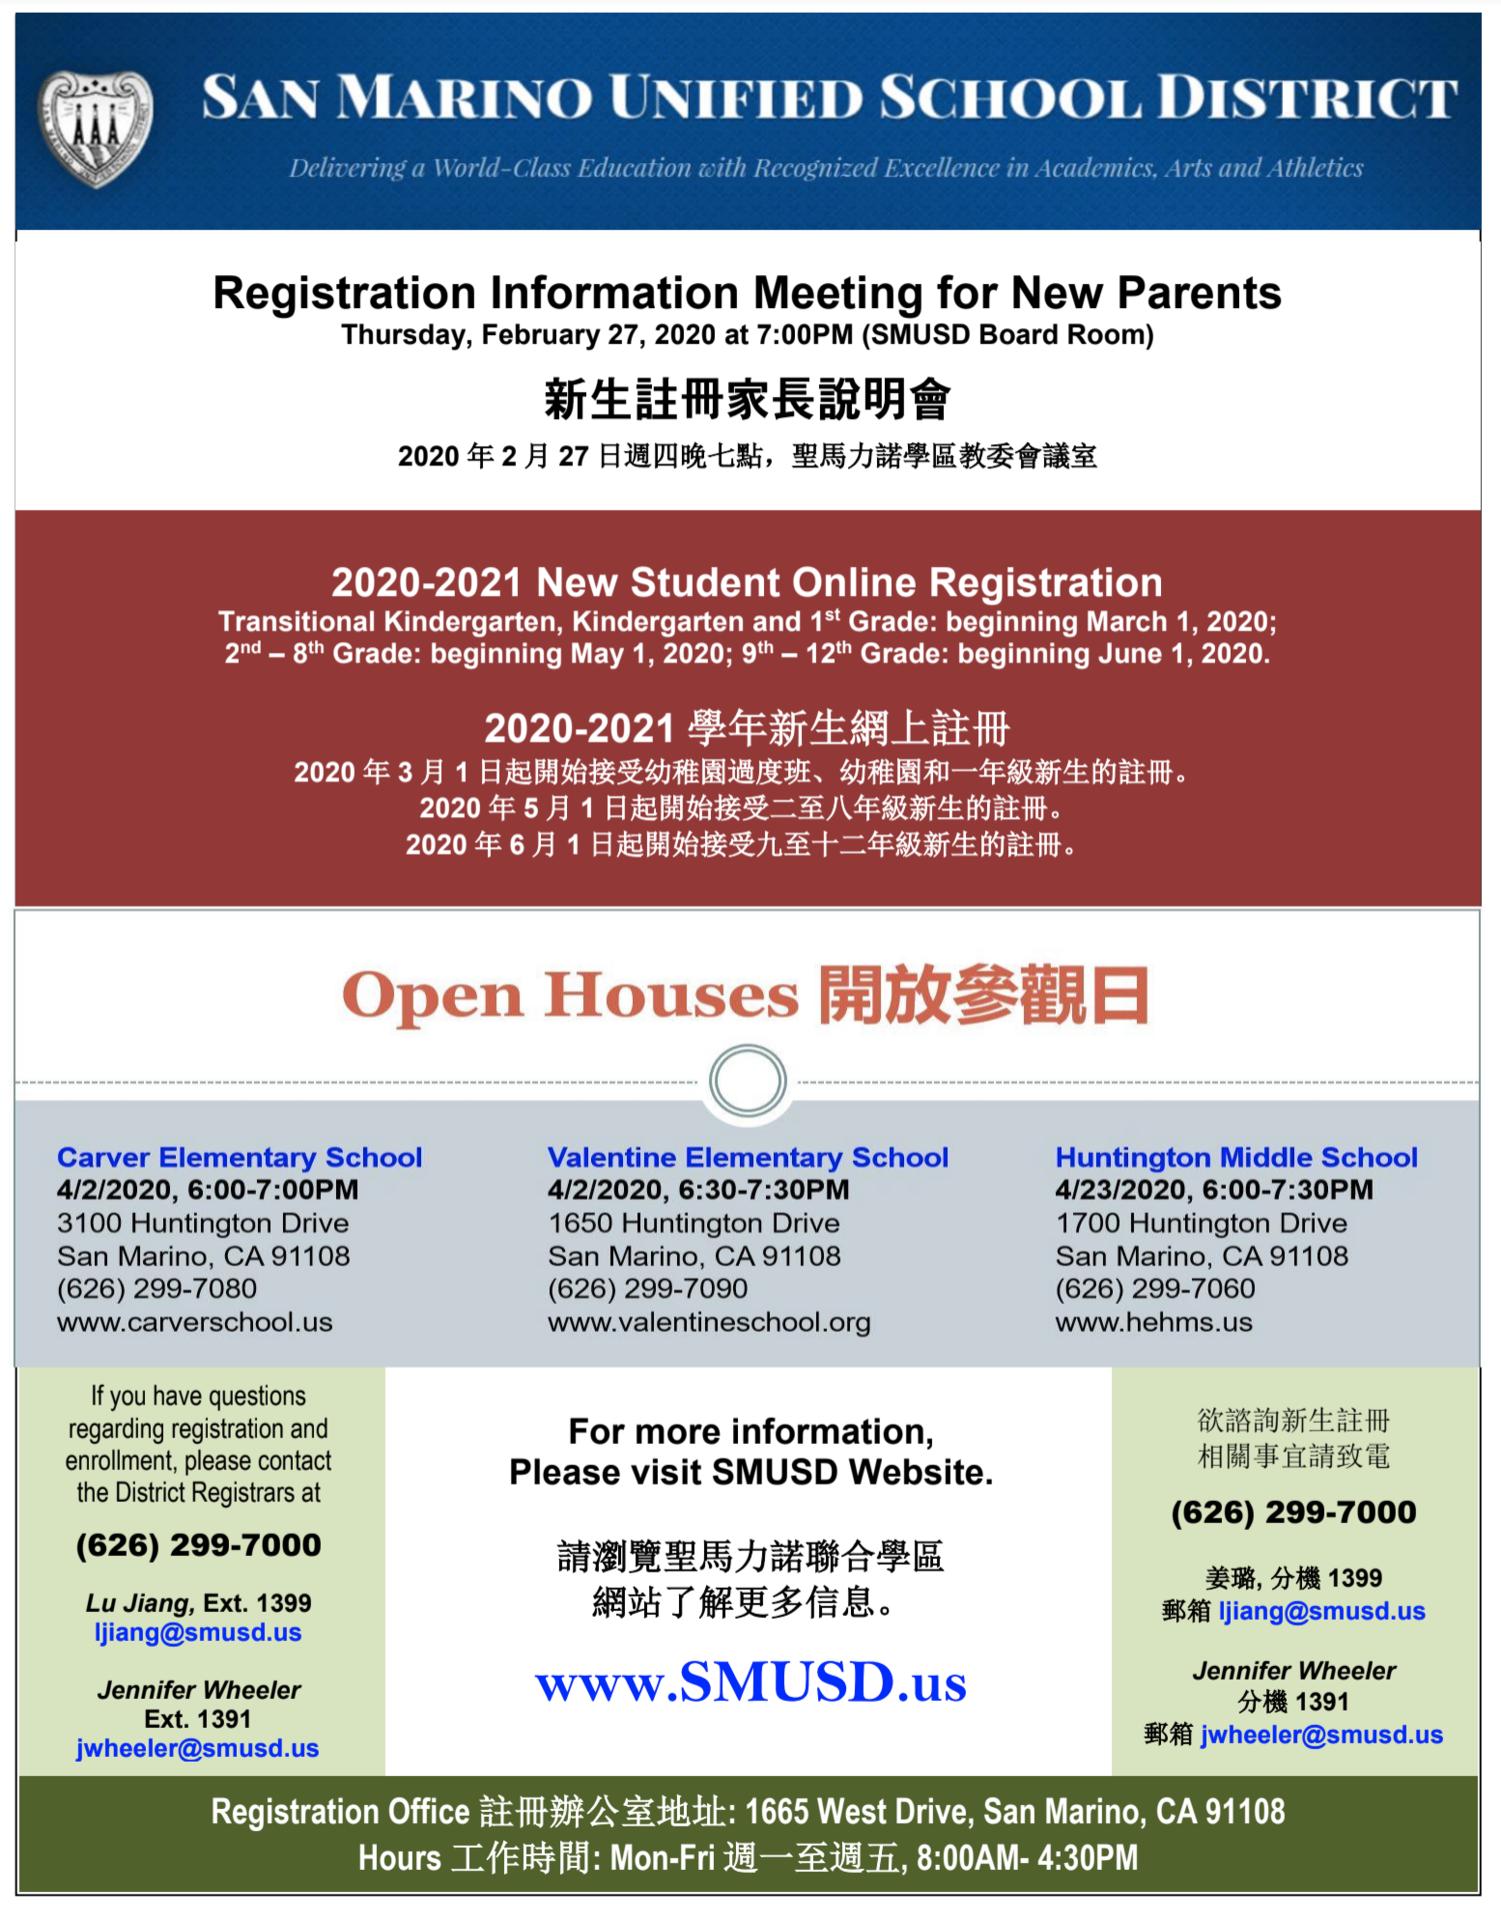 Registration Information Meeting